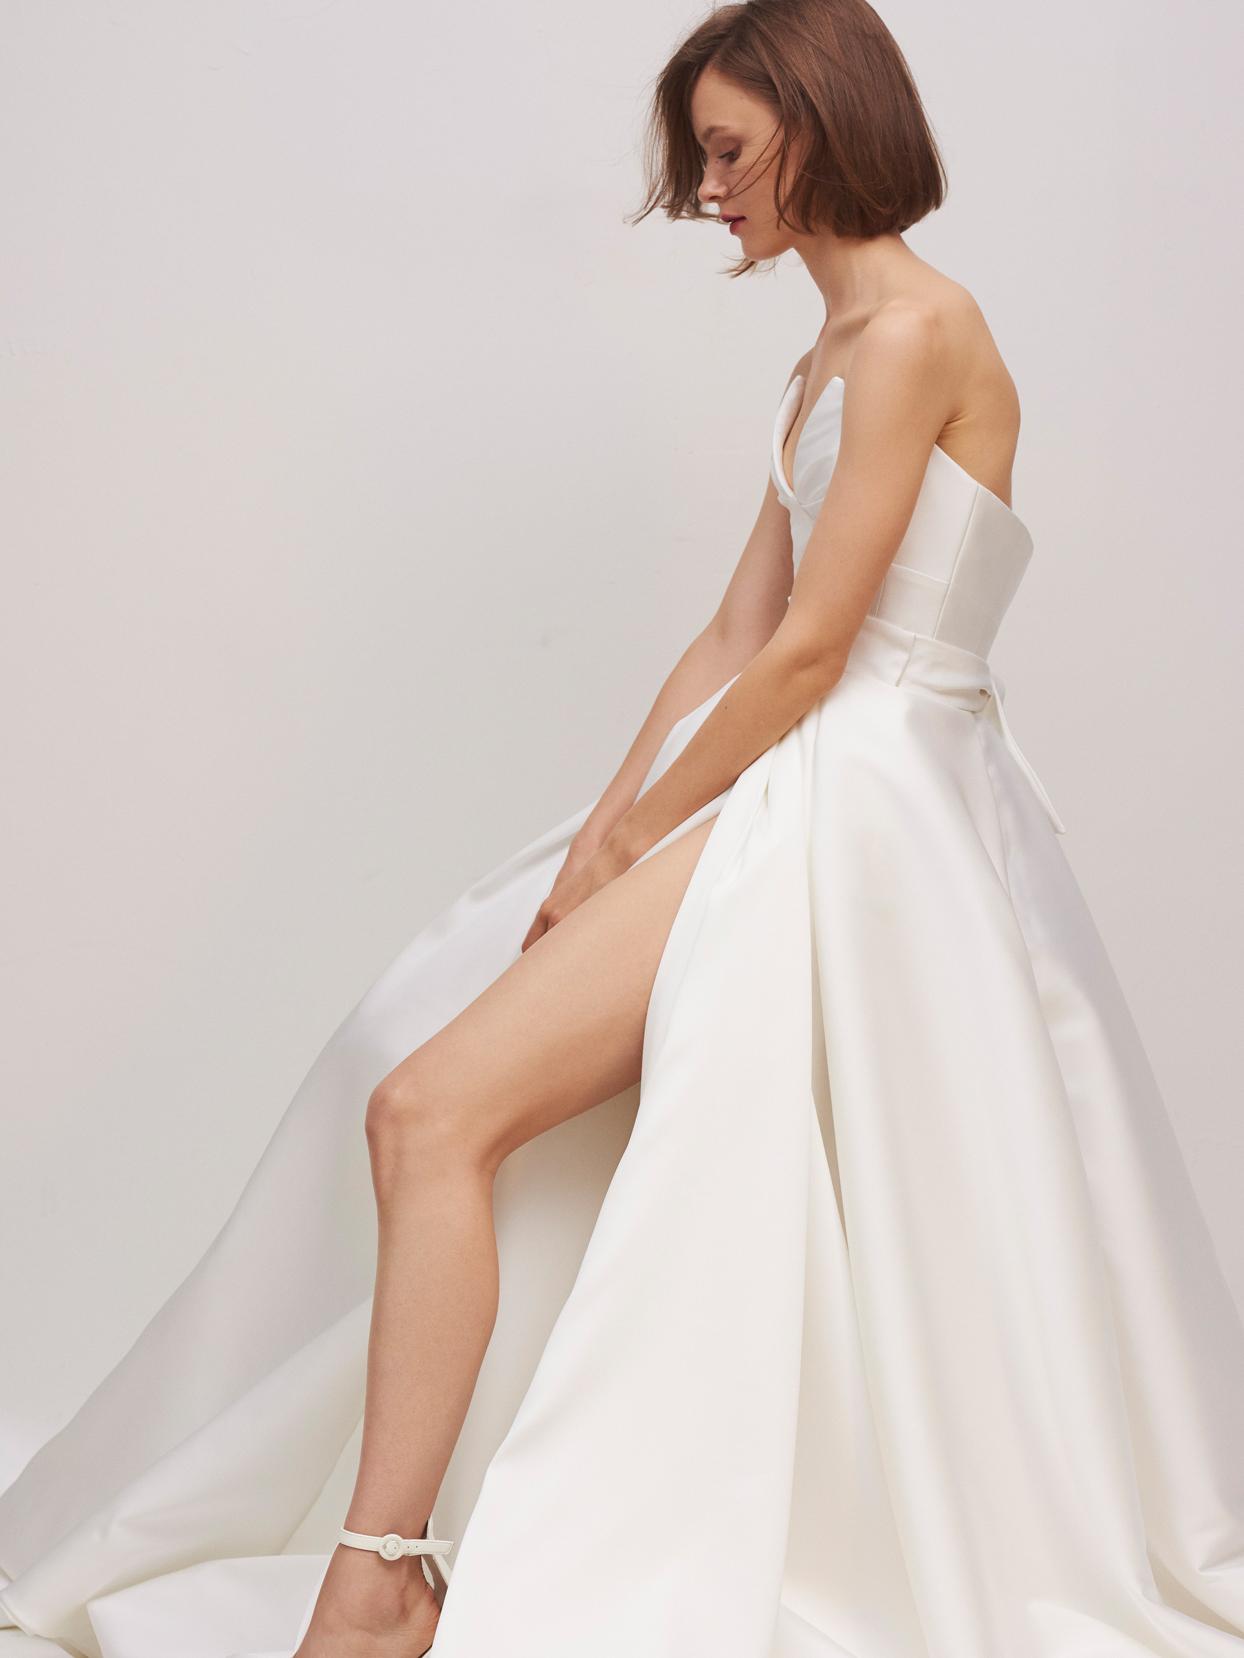 rivini by rita vinieris strapless a-line wedding dress with high slit fall 2020